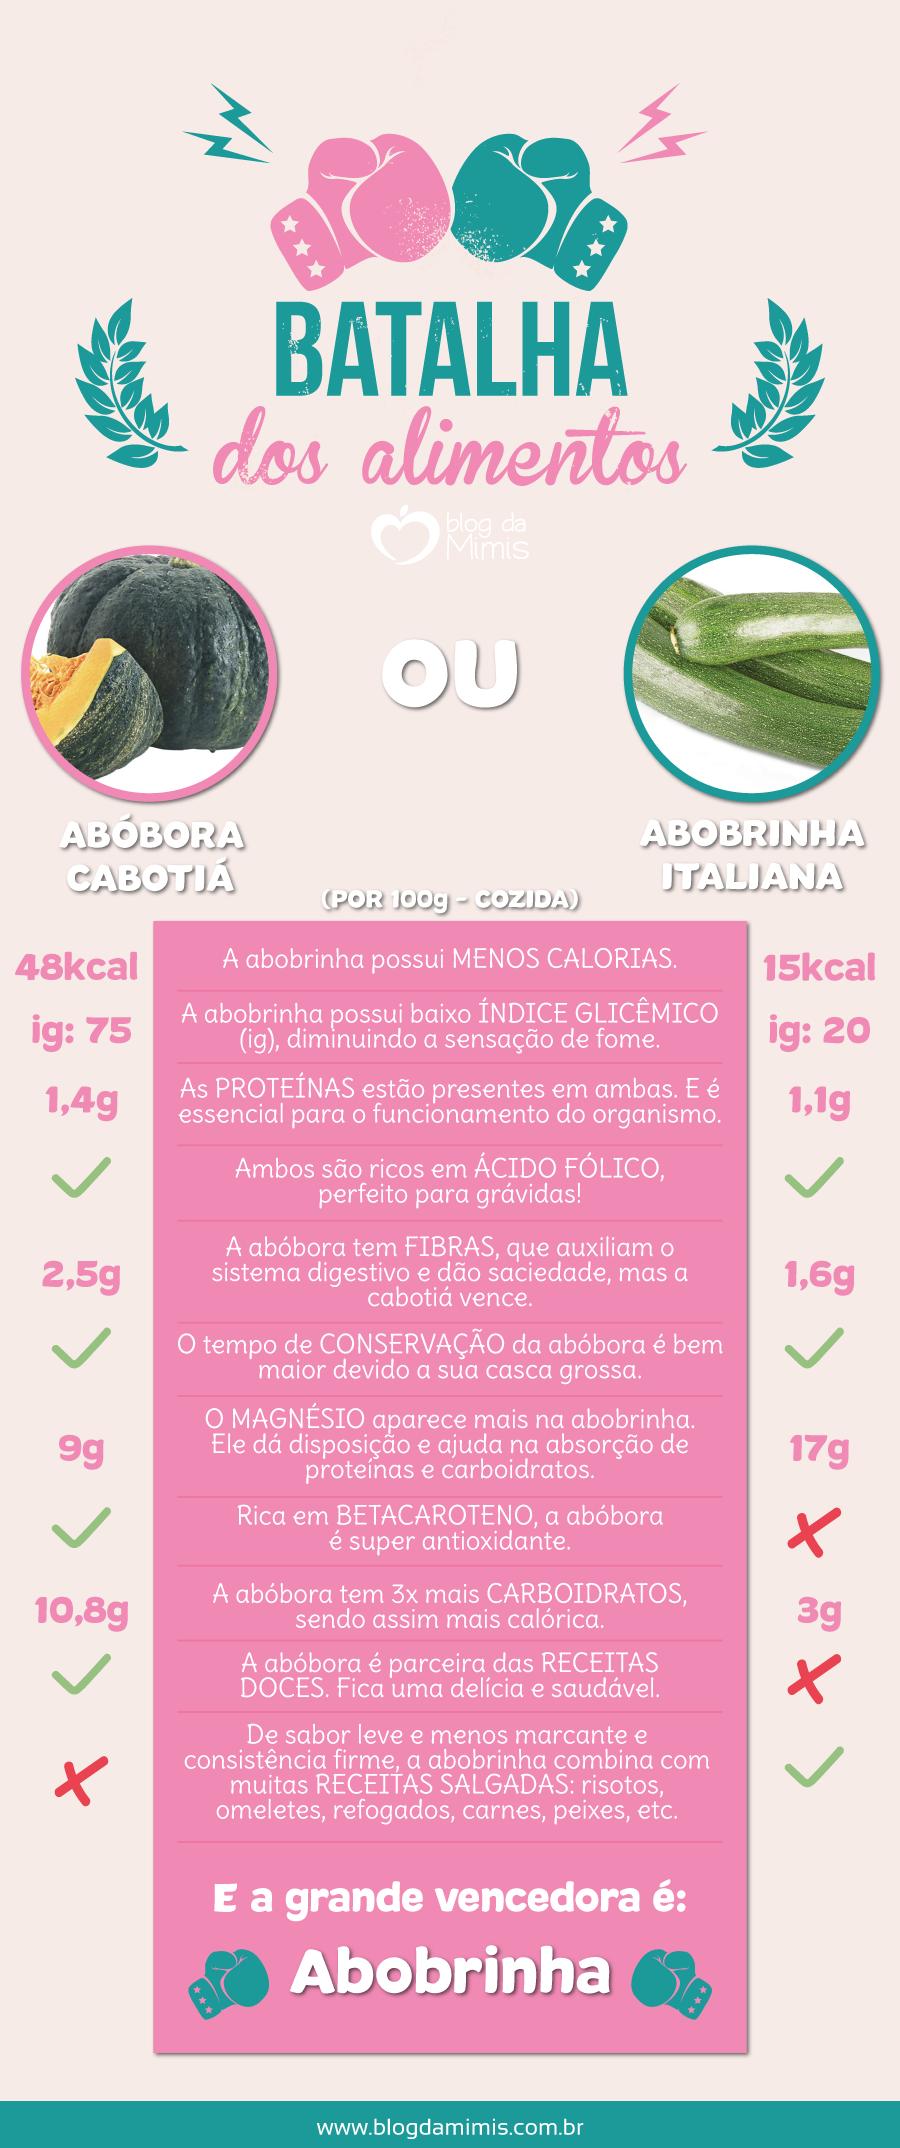 batalha-abobora-abobrinha-blog-da-mimis-michelle-fanzoni-post